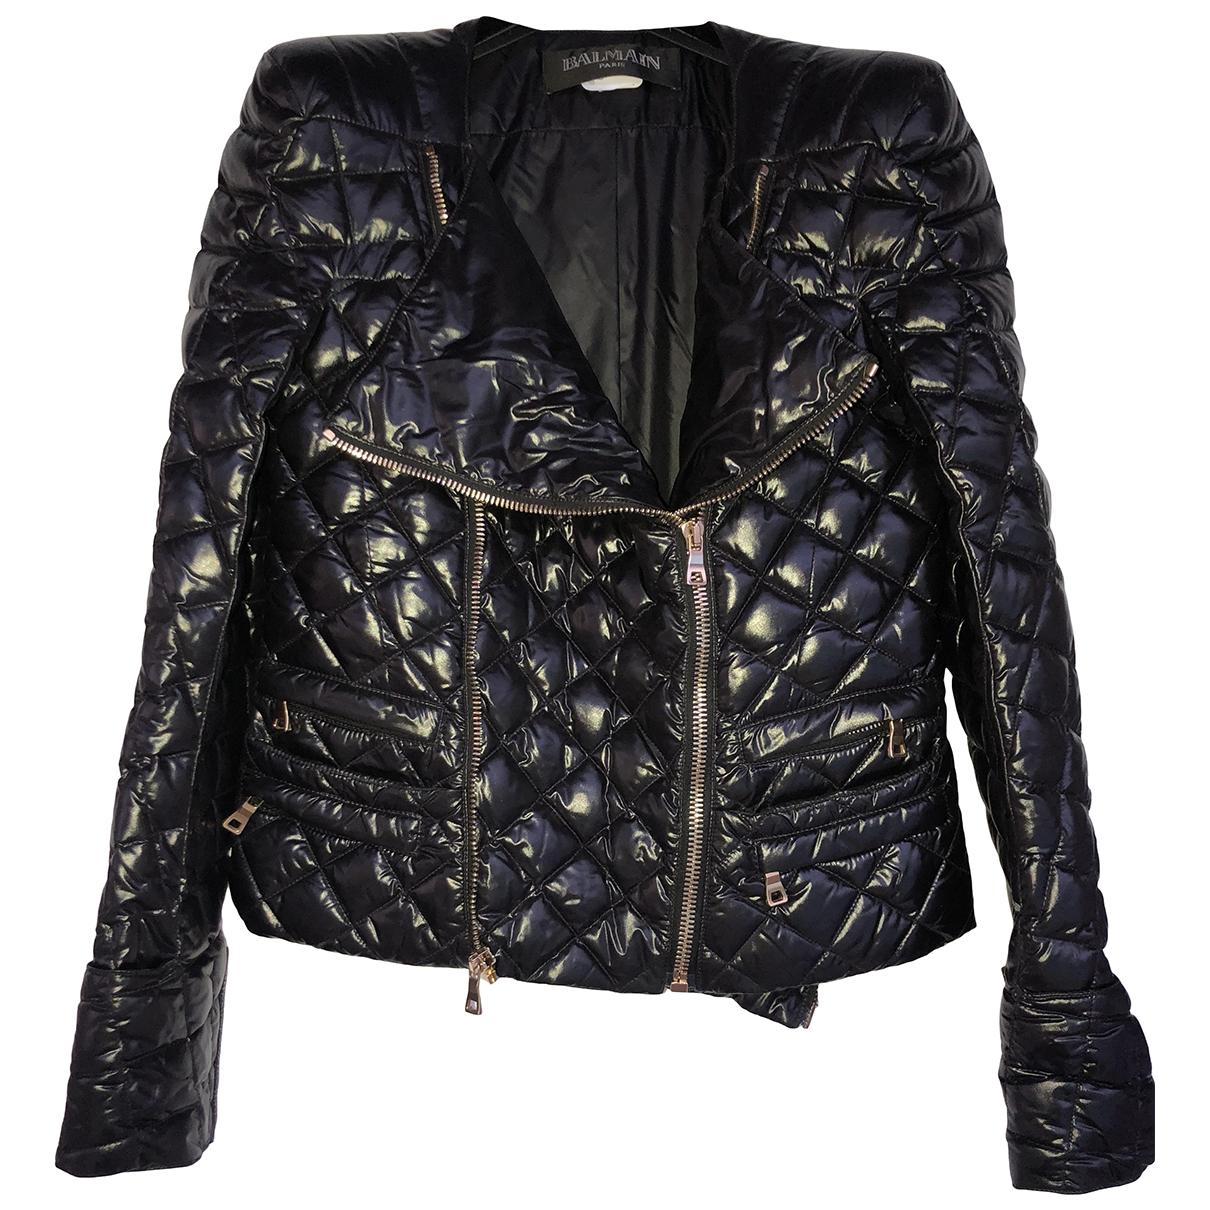 Balmain \N Black Leather jacket for Women 36 FR